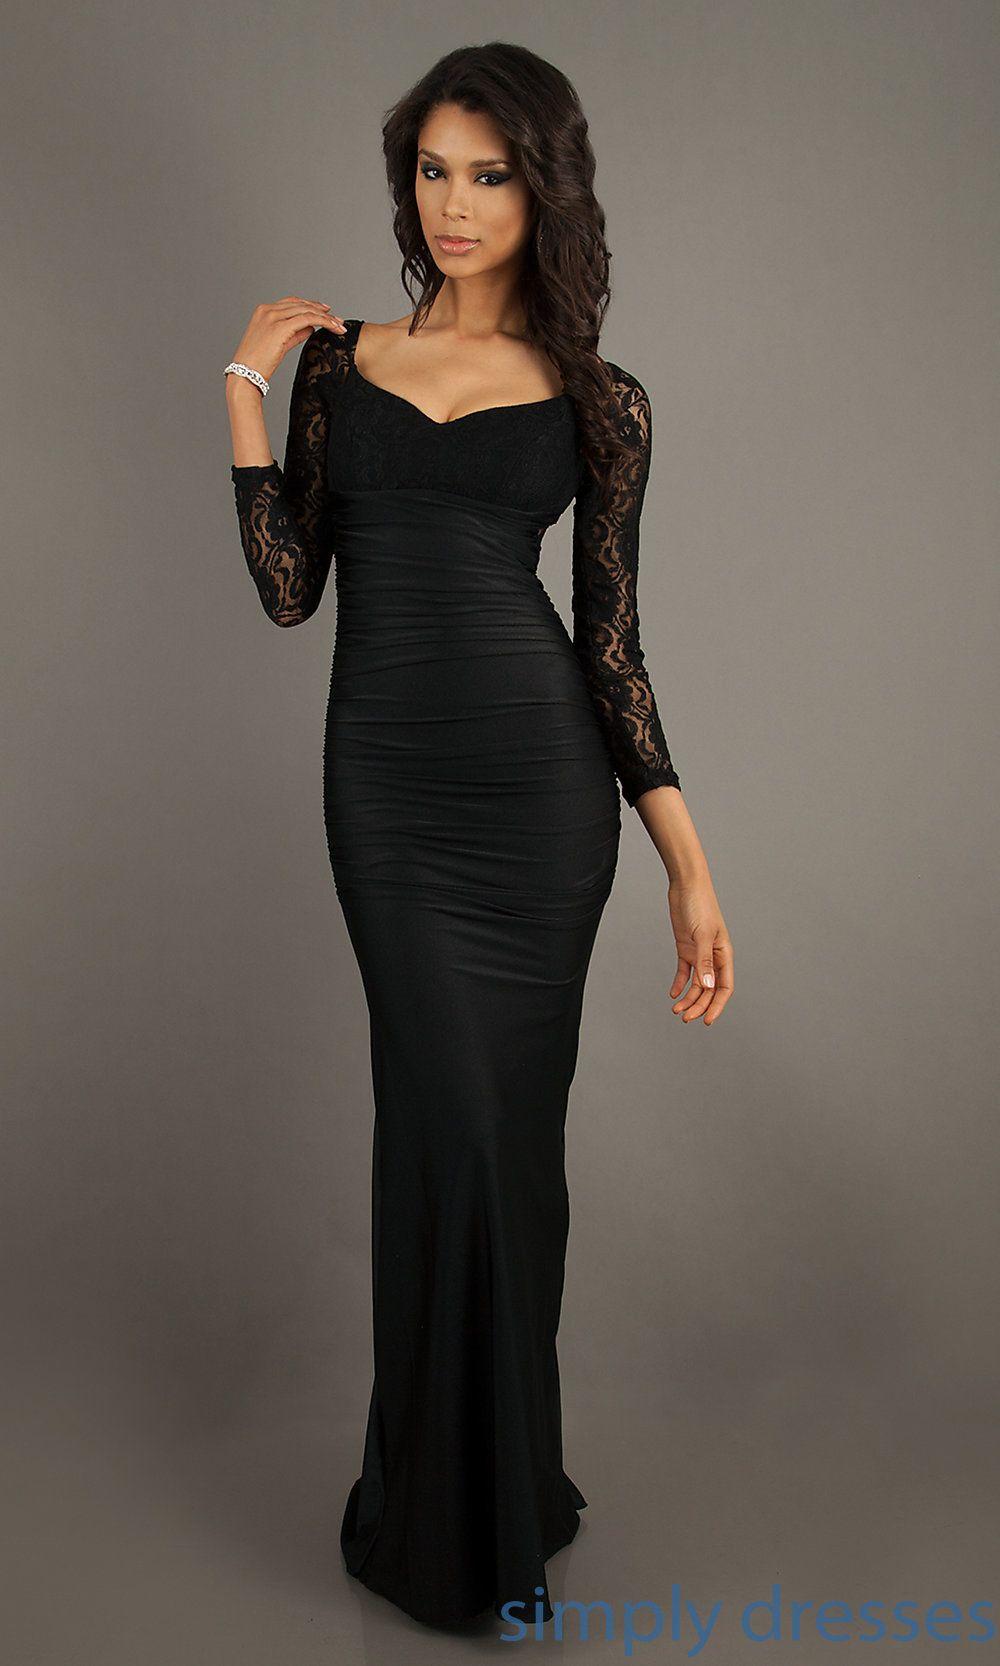 Long Sleeved Floor Length Dress, Sexy Prom Gowns | Floor length ...